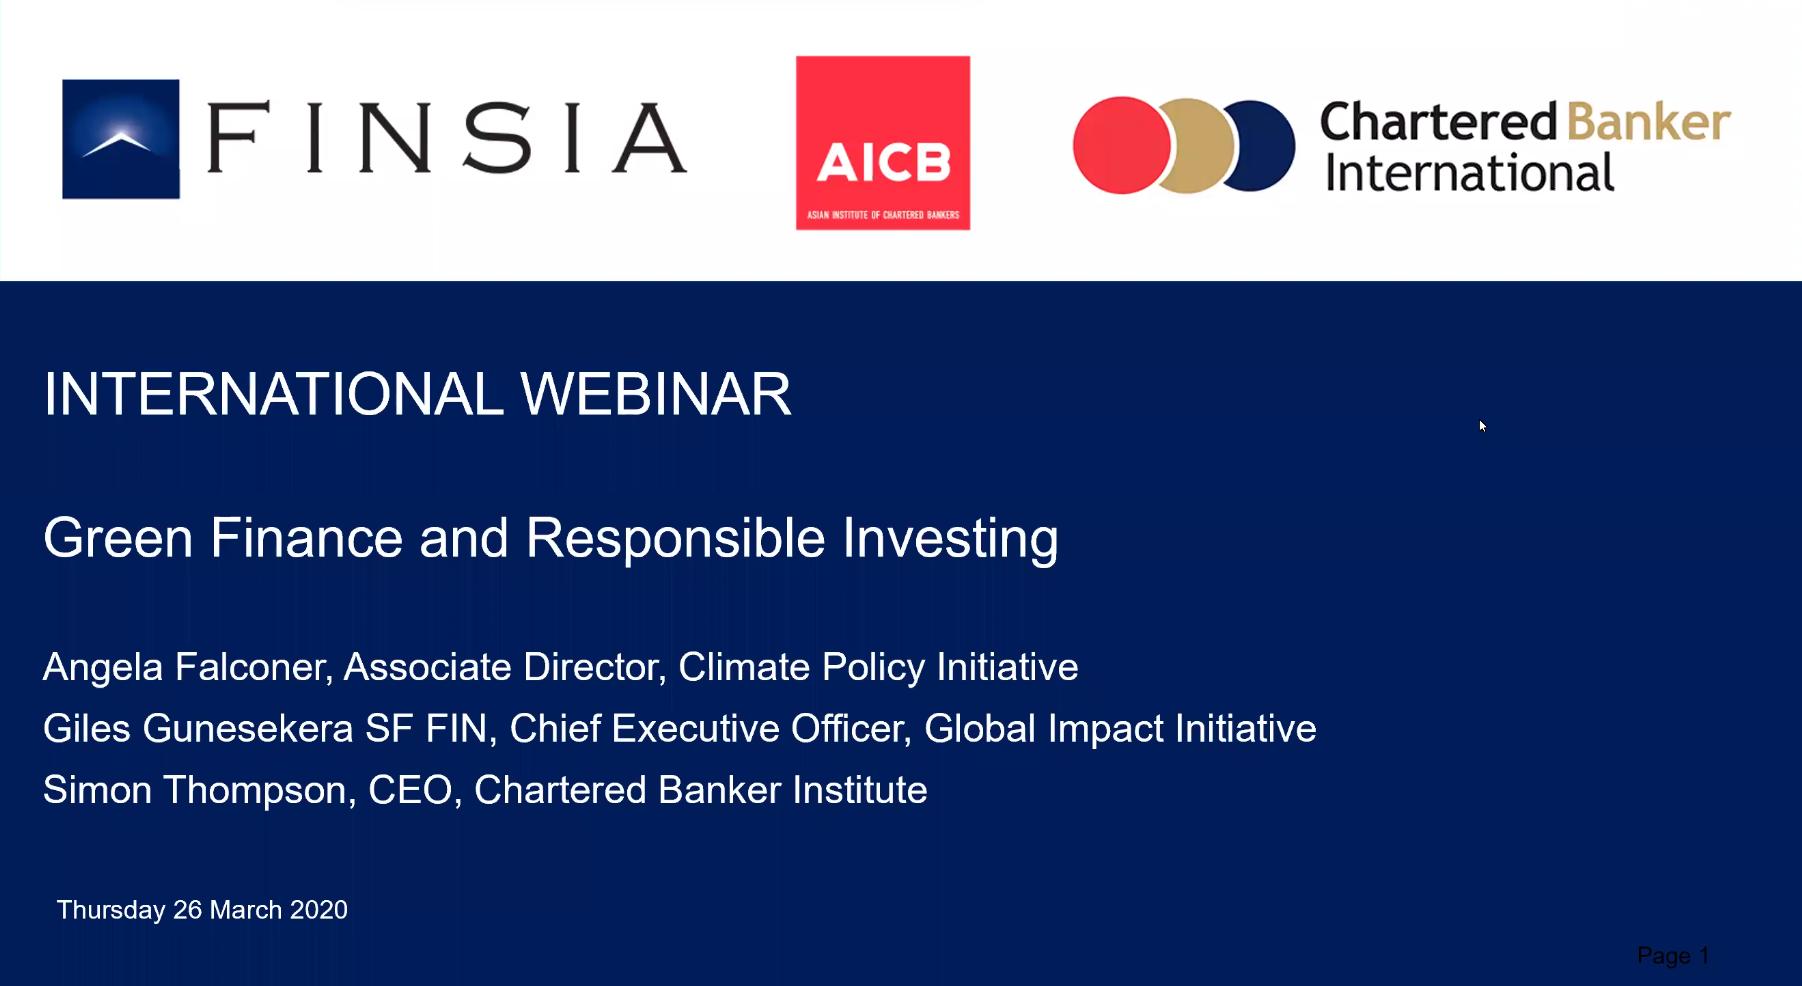 International Webinar: Green Finance and Responsible Investing